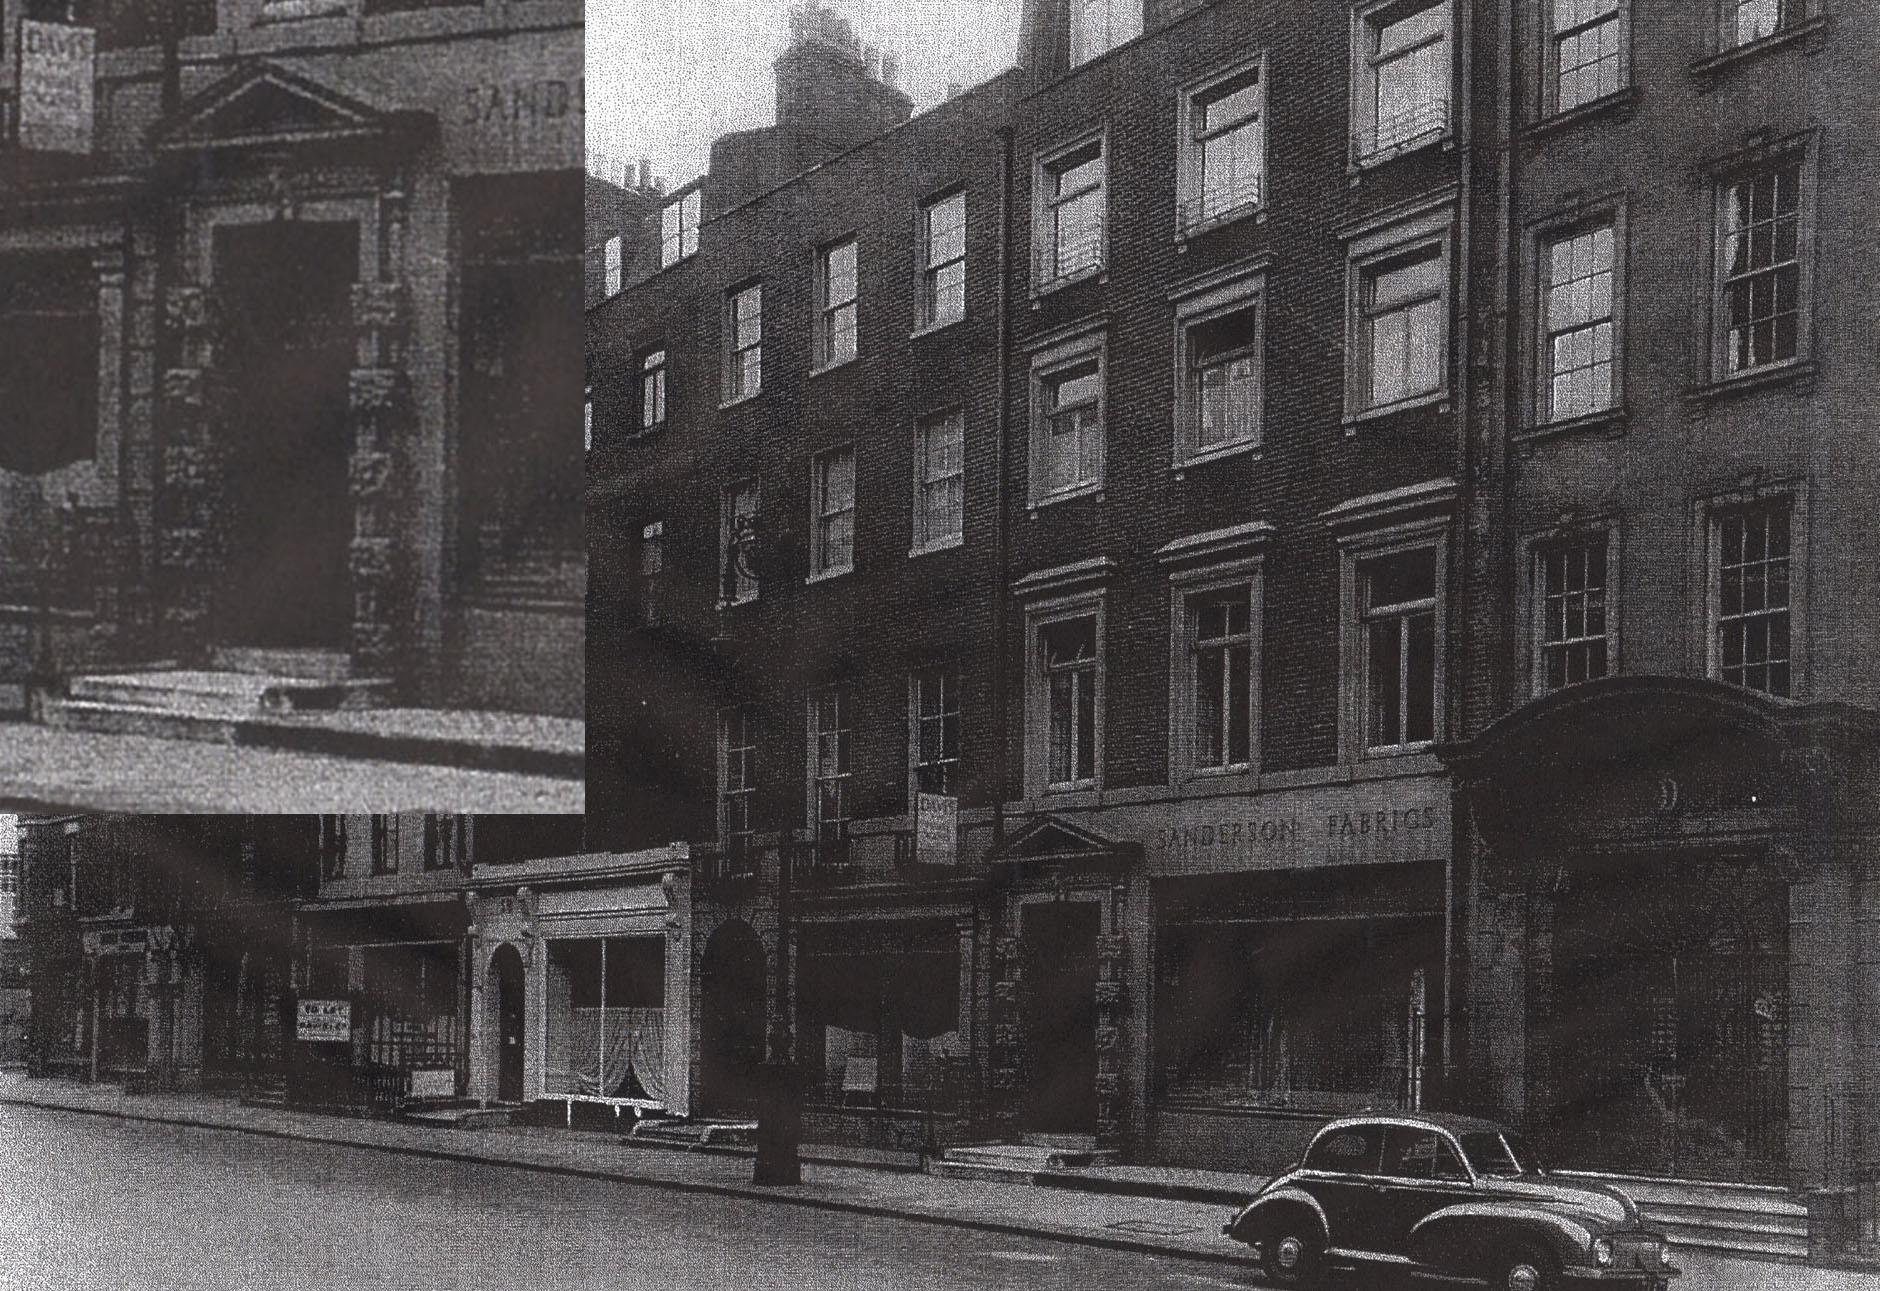 Berners Street (inset: doorcase enlarged)